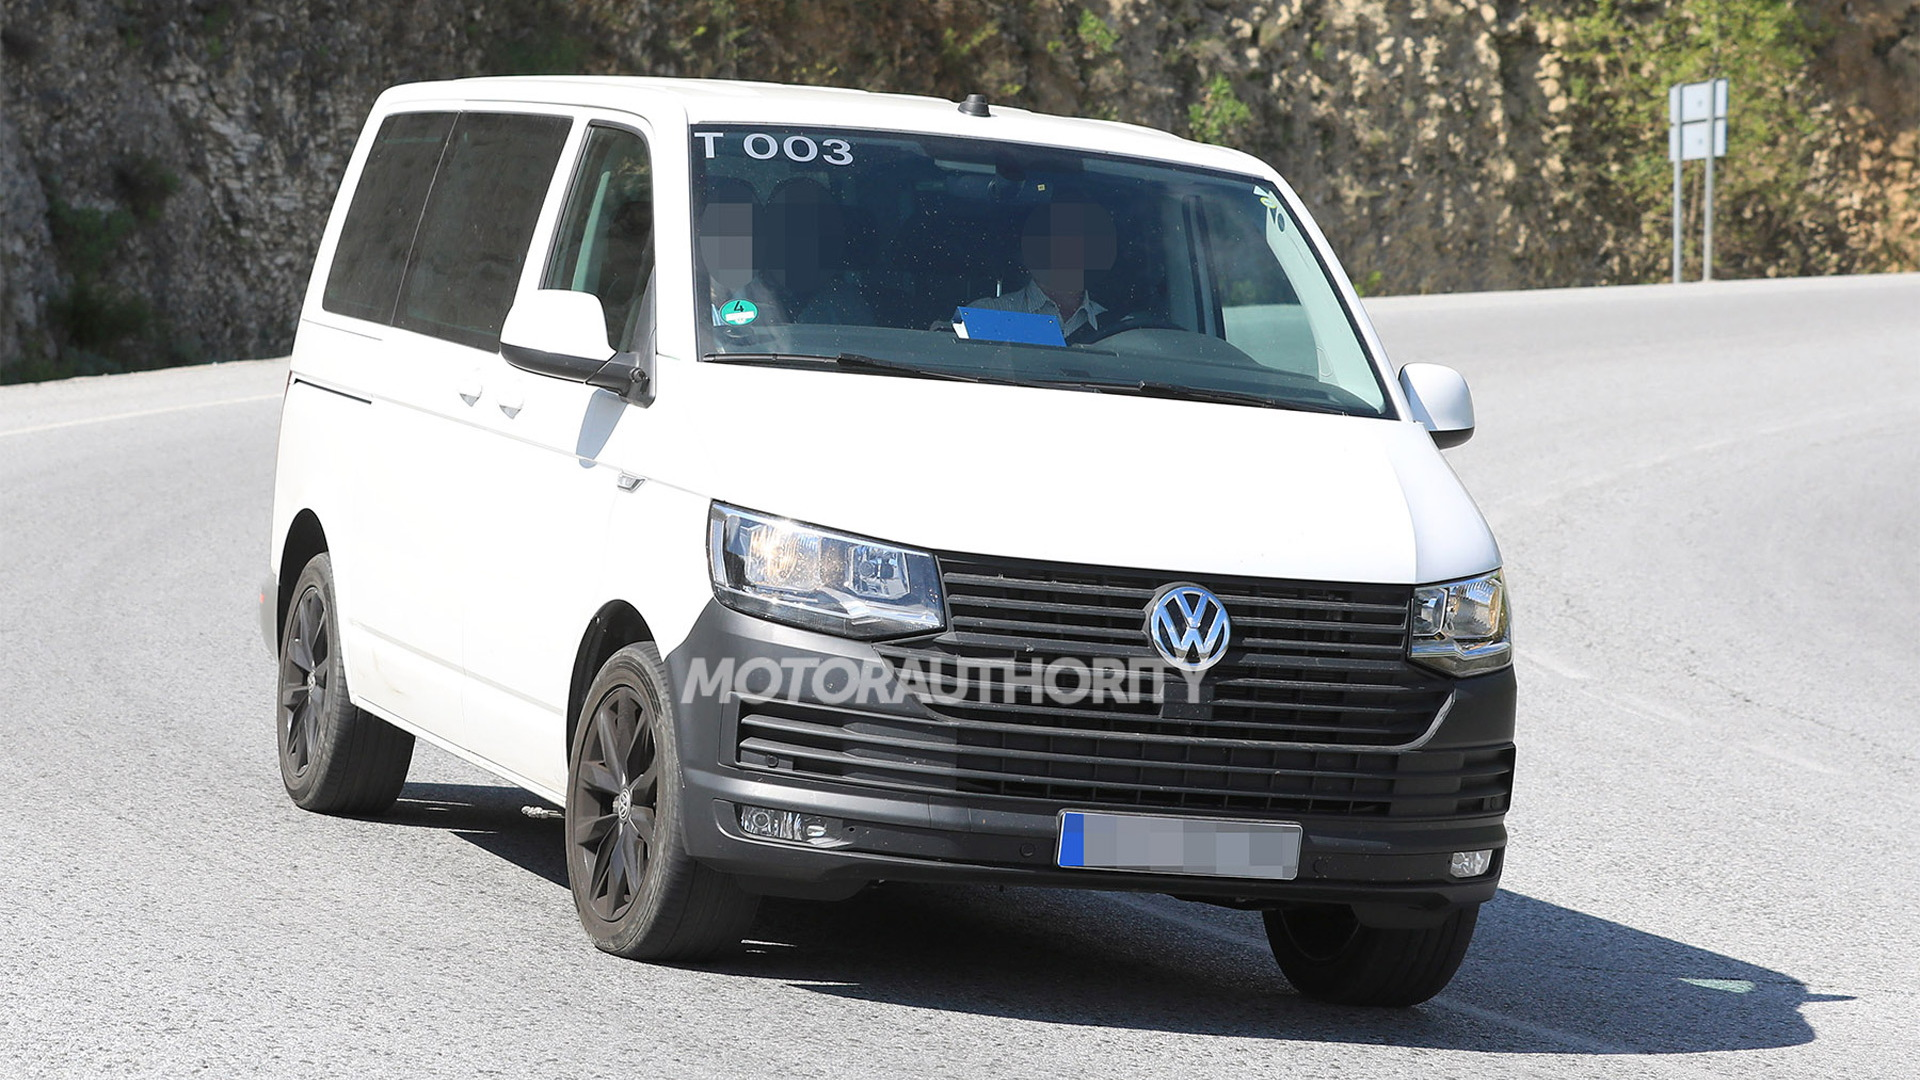 2020 Volkswagen Transporter (T7) test mule spy shots - Image via S. Baldauf/SB-Medien